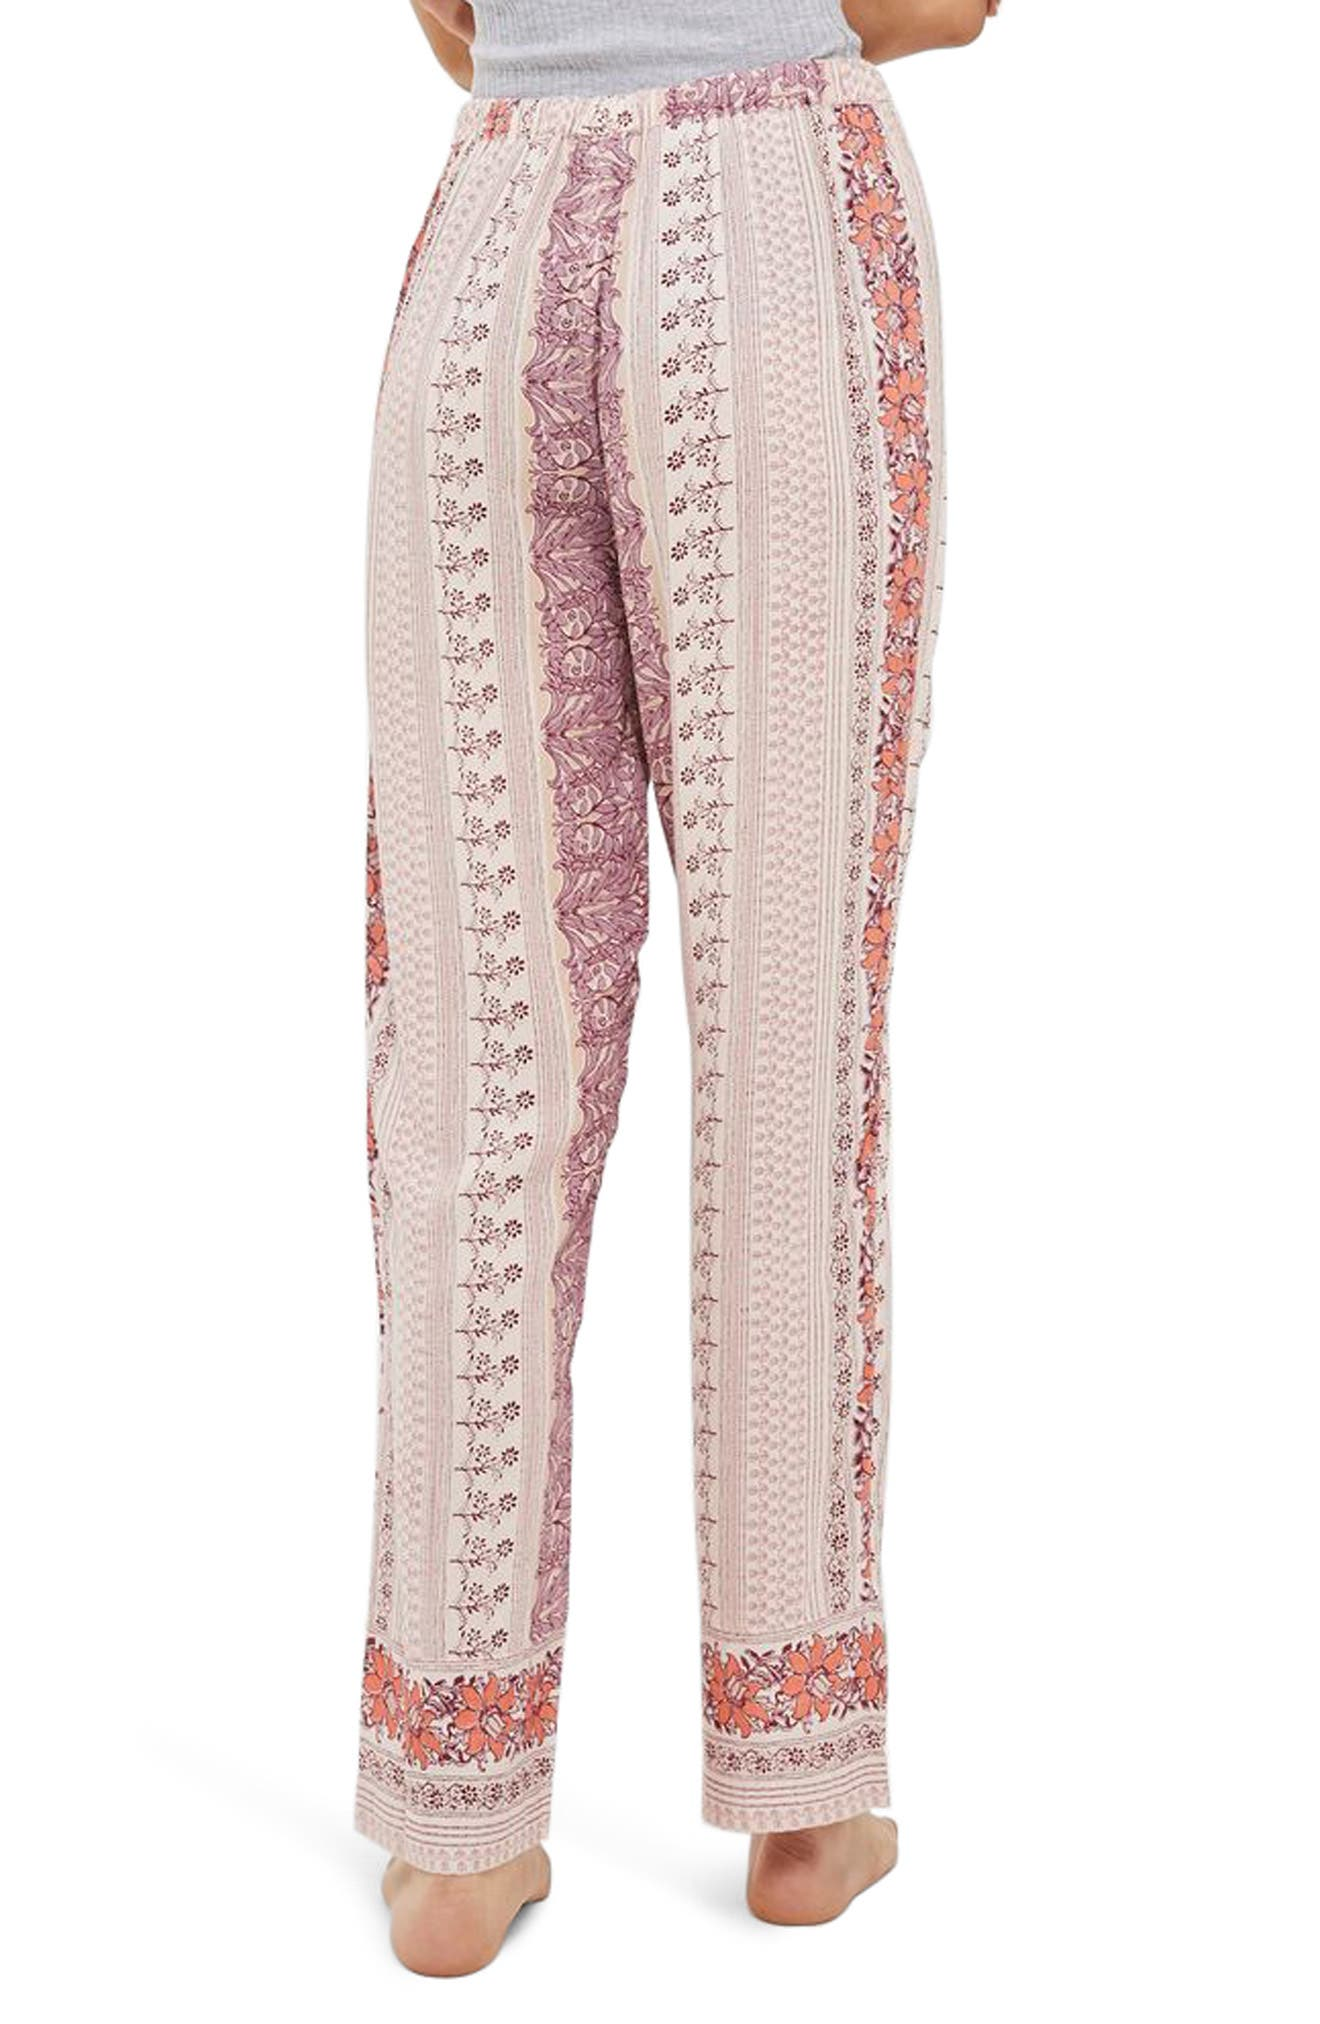 Bohemian Floral Print Pajama Pants,                             Alternate thumbnail 2, color,                             Lilac Multi